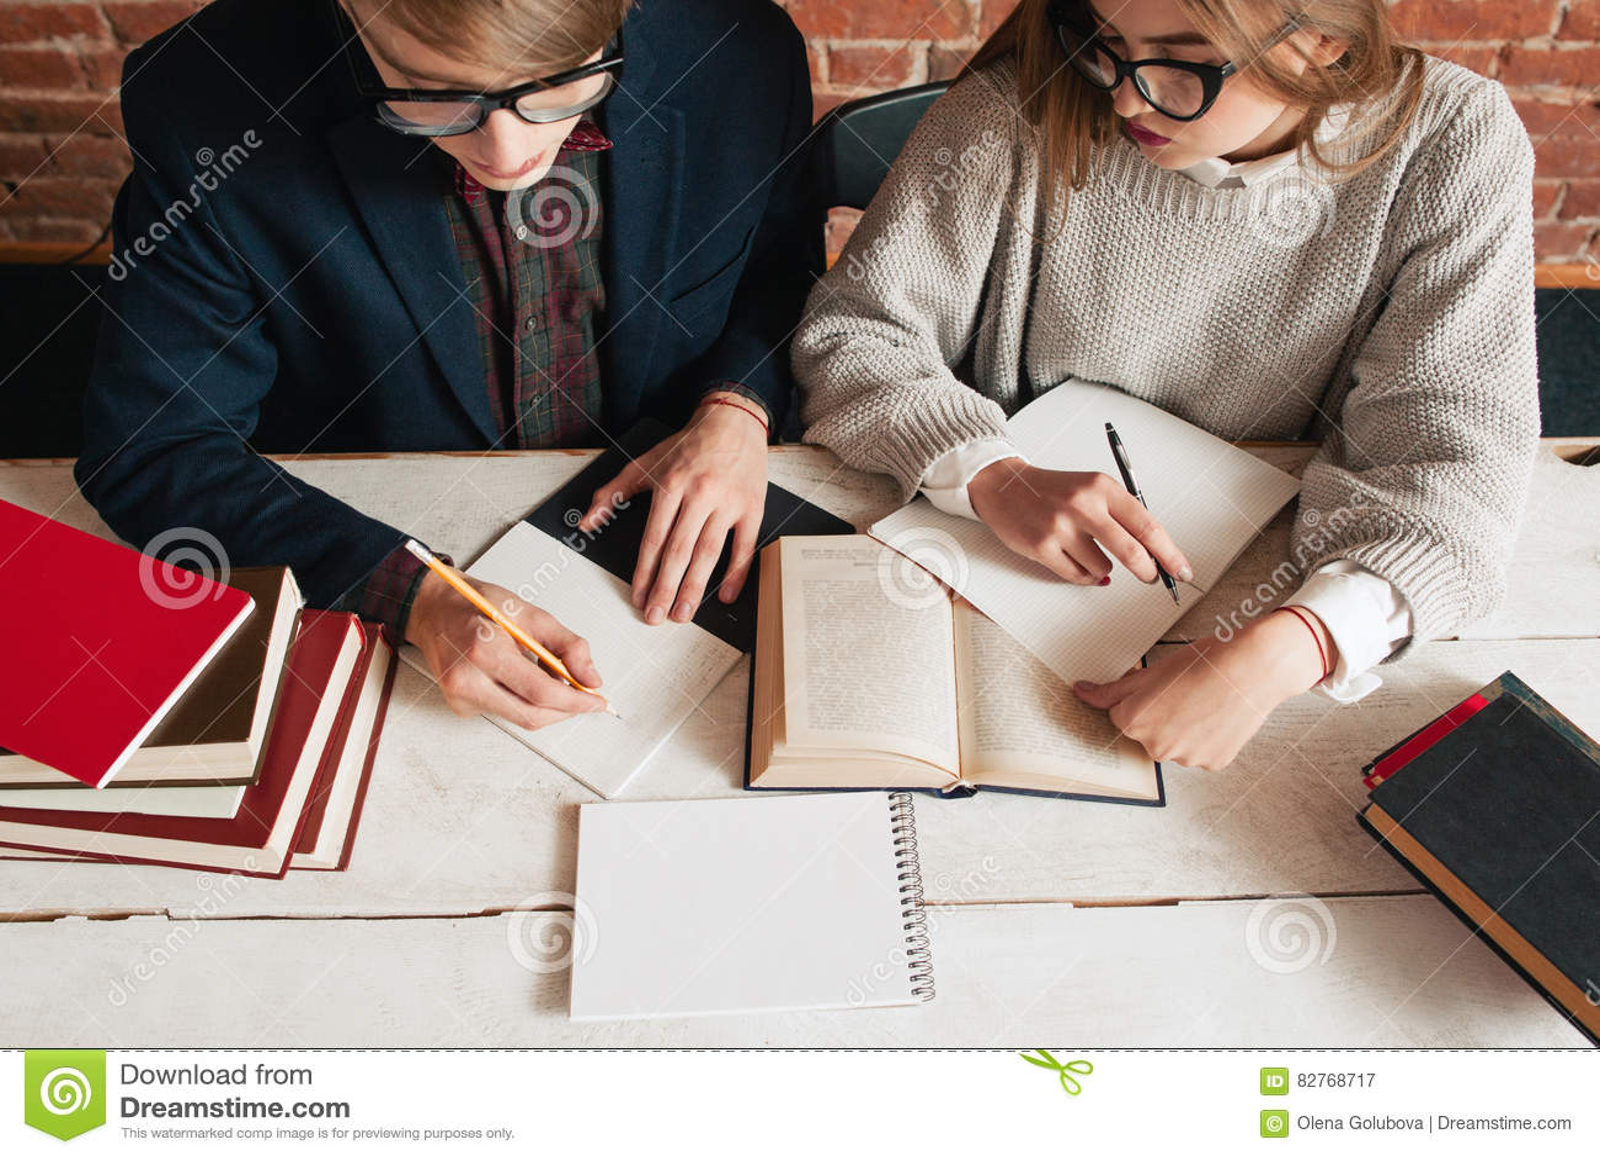 Studenten bemannen und Frau rekapitulieren Draufsicht des Textes